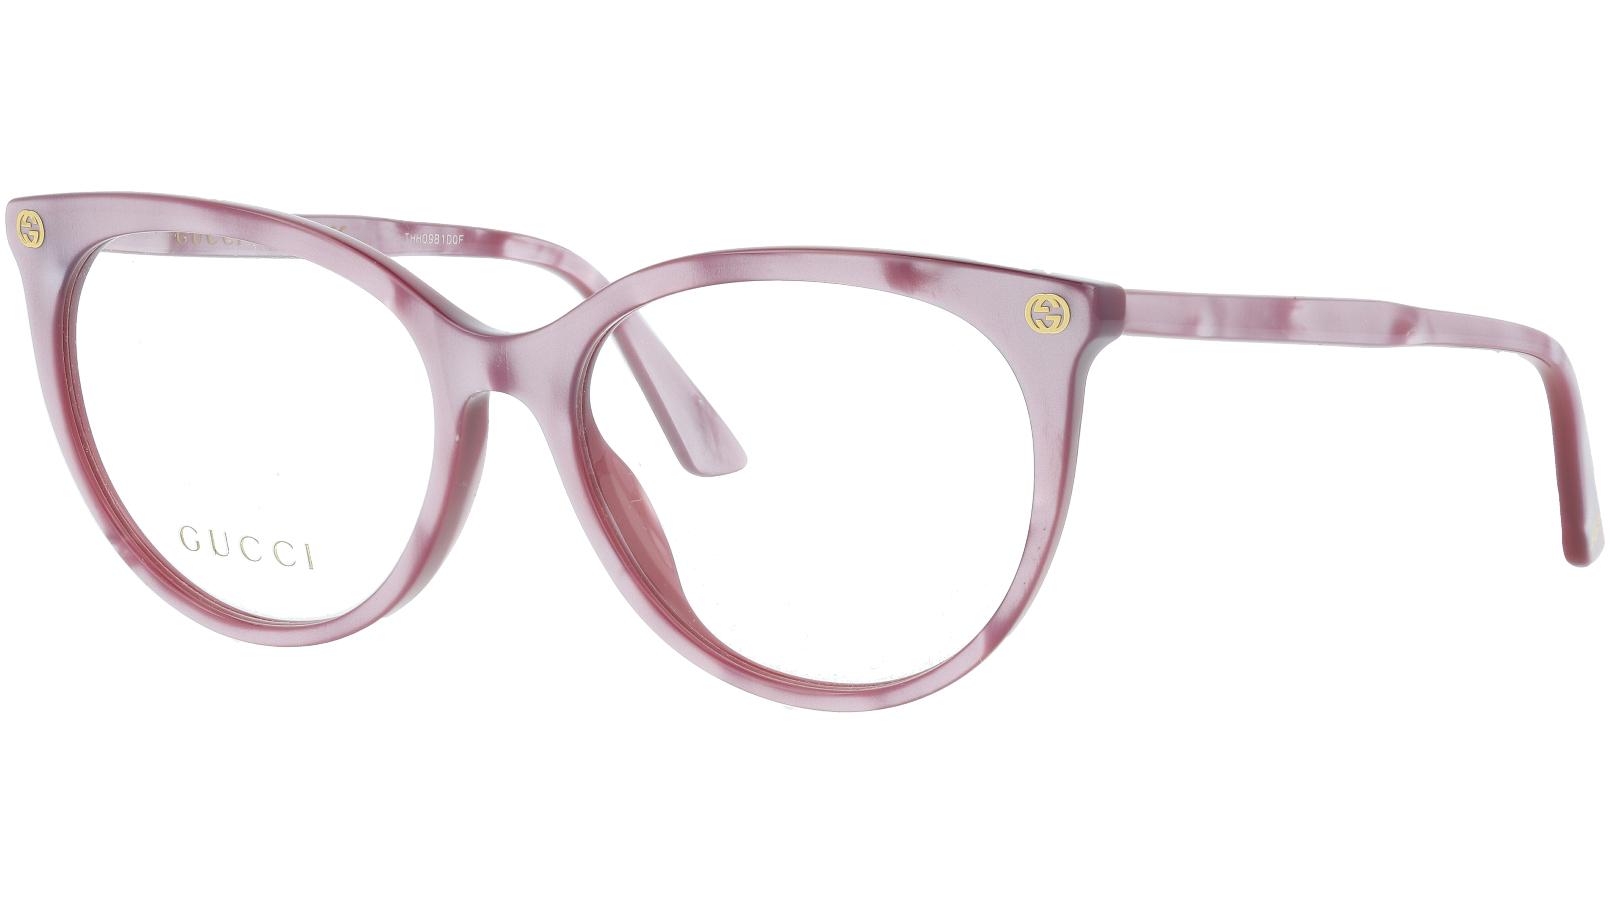 GUCCI GG0093O 004 53 PINK Glasses